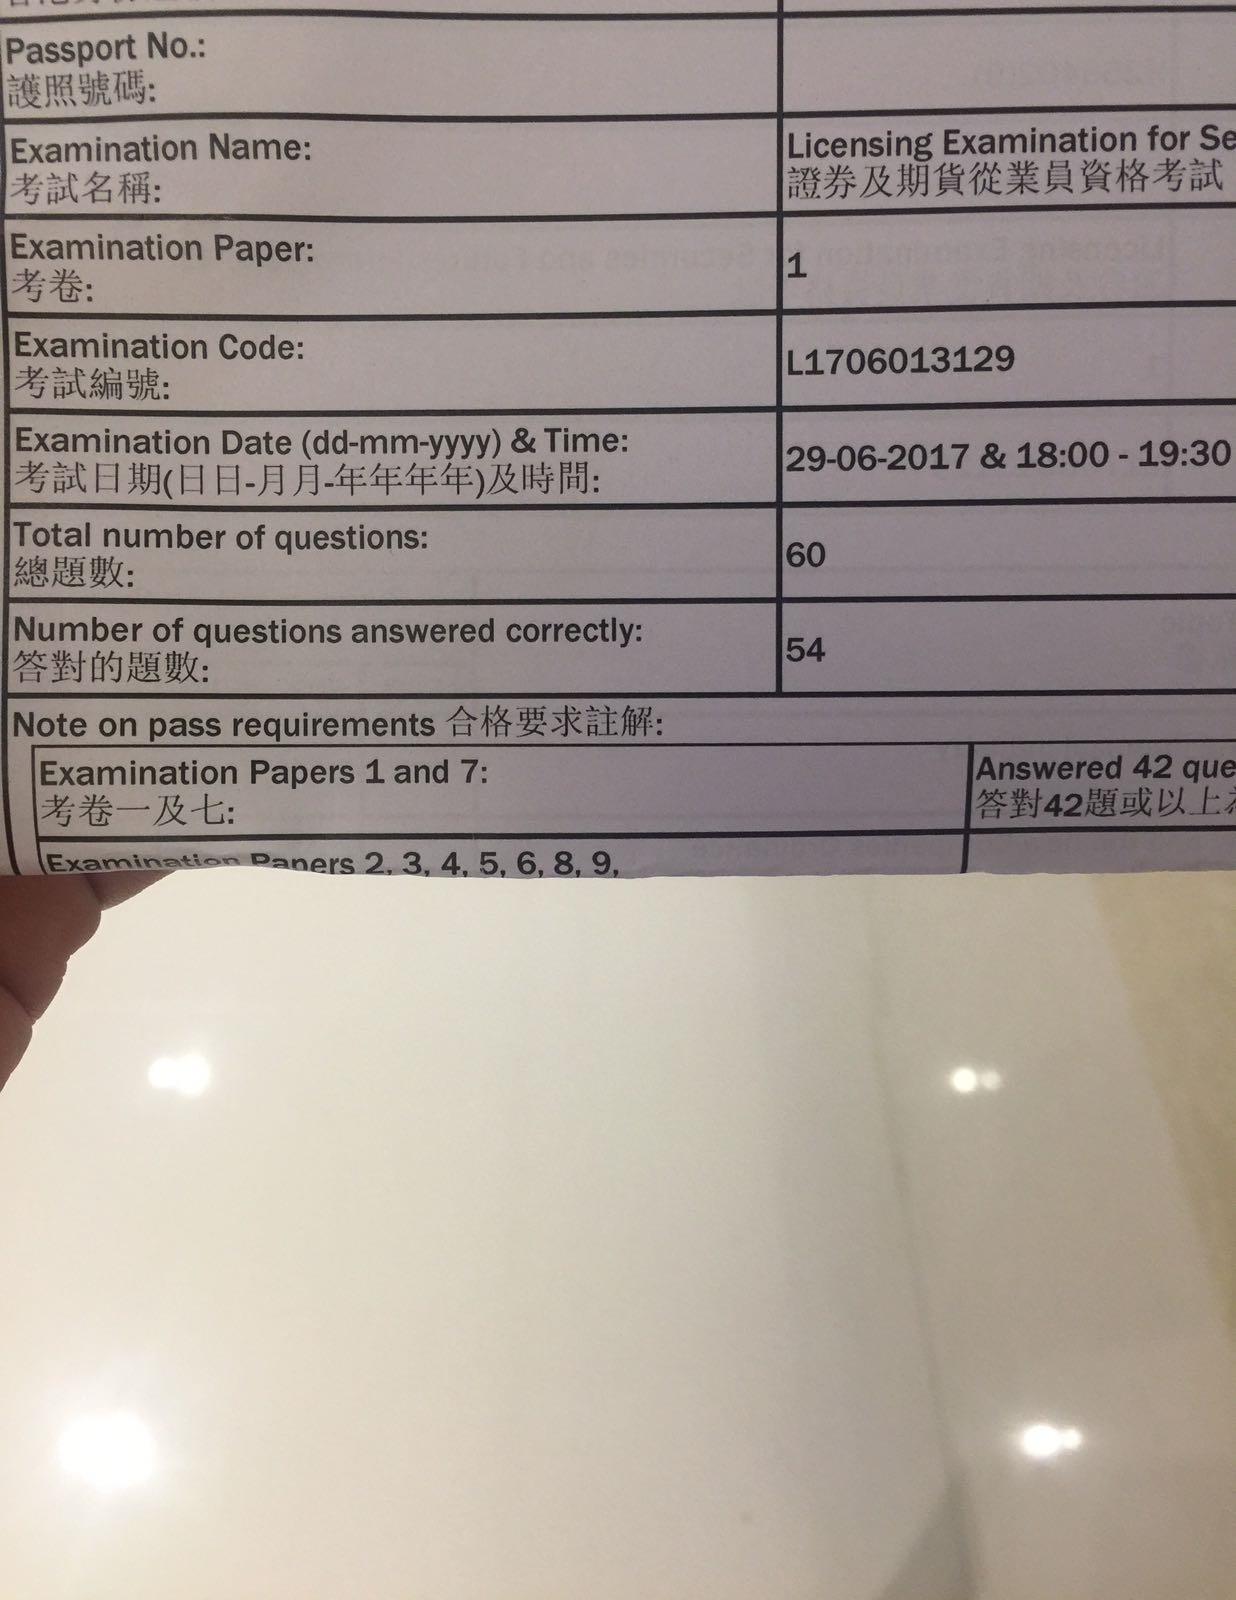 CFIW 29/6/2017 LE Paper 1 證券期貨從業員資格考試卷一 Pass